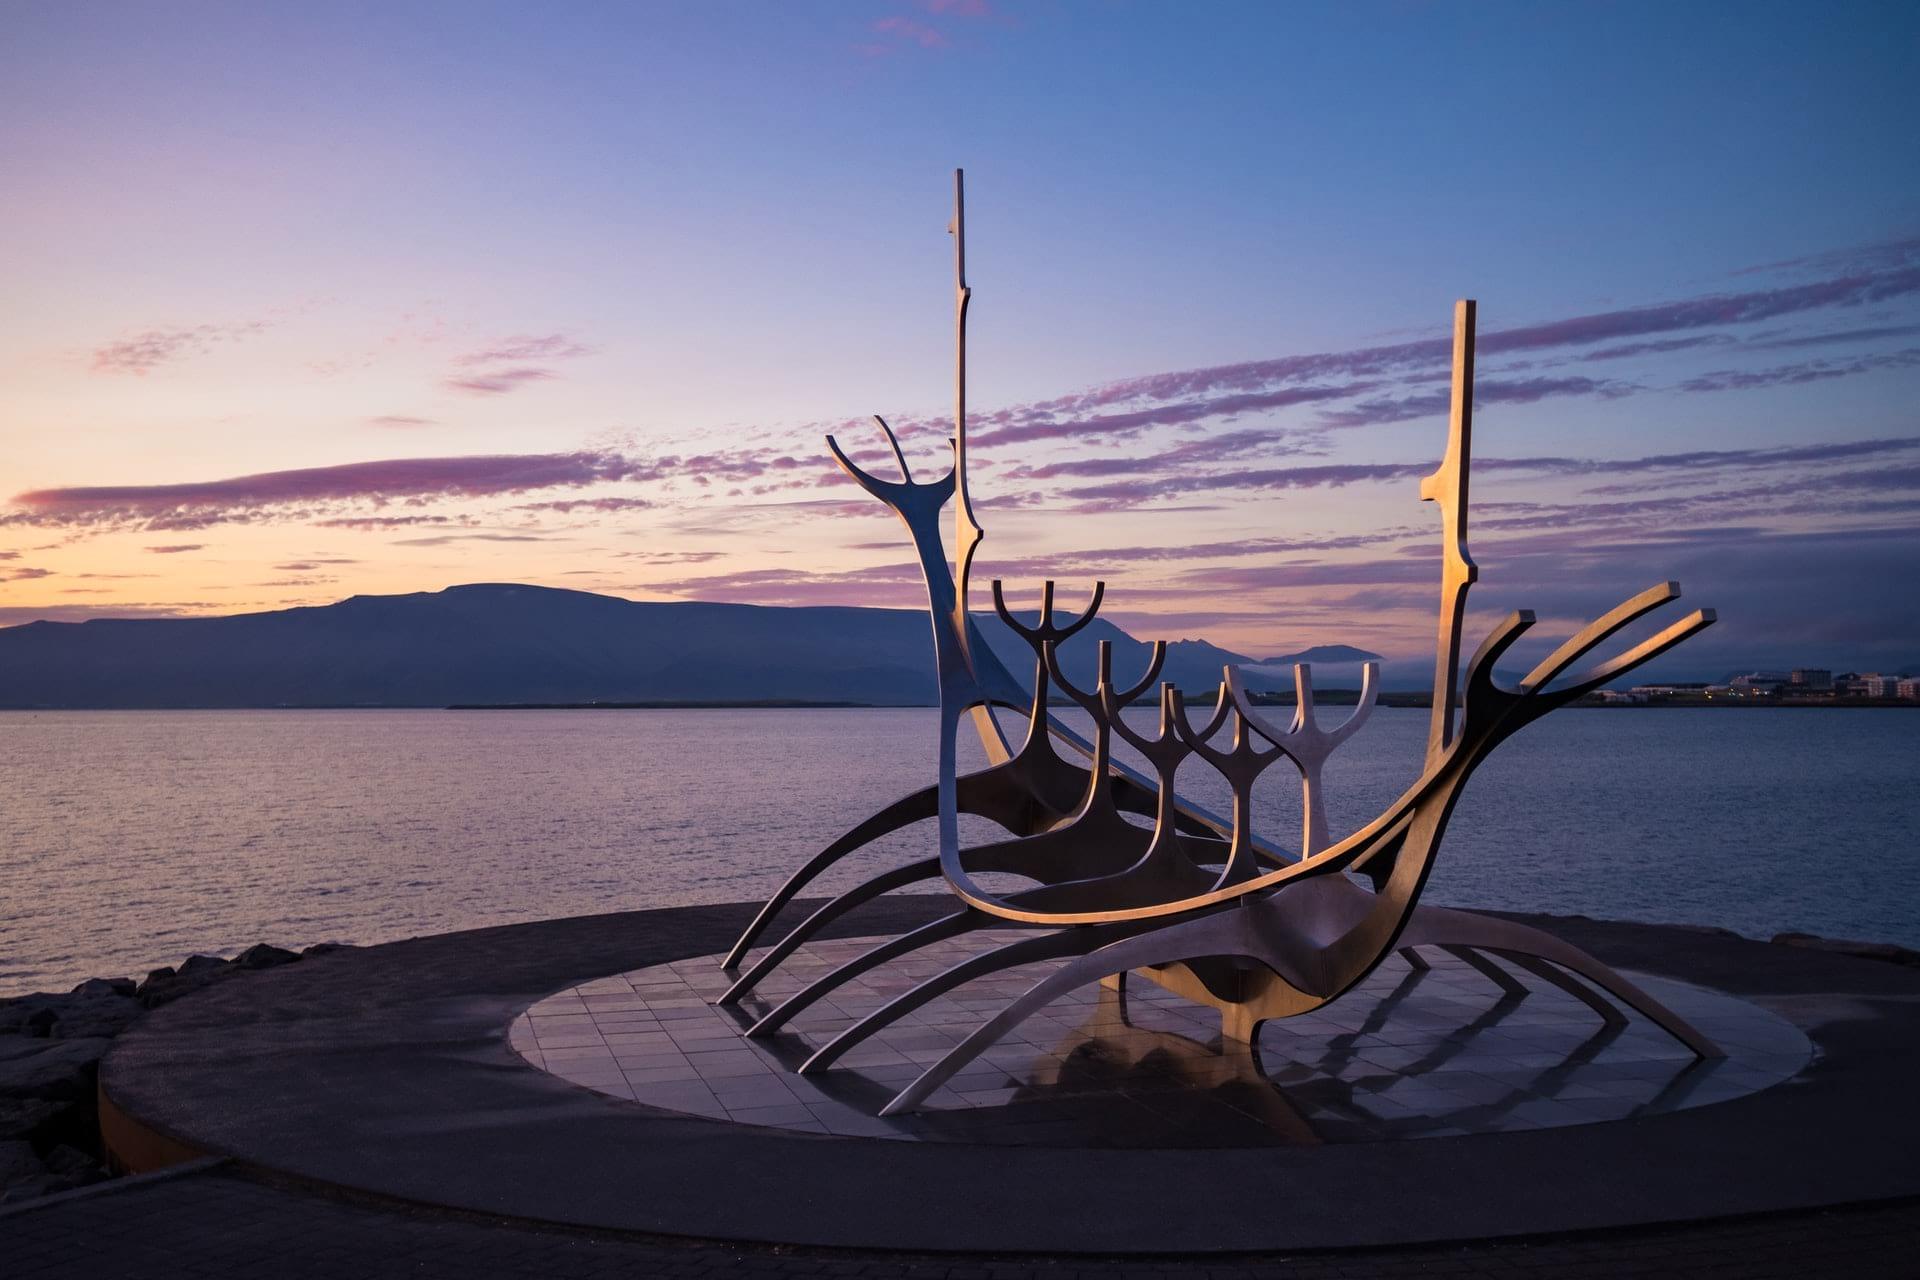 Reykjavik midnight-sun over Sun Voyager Sculpture